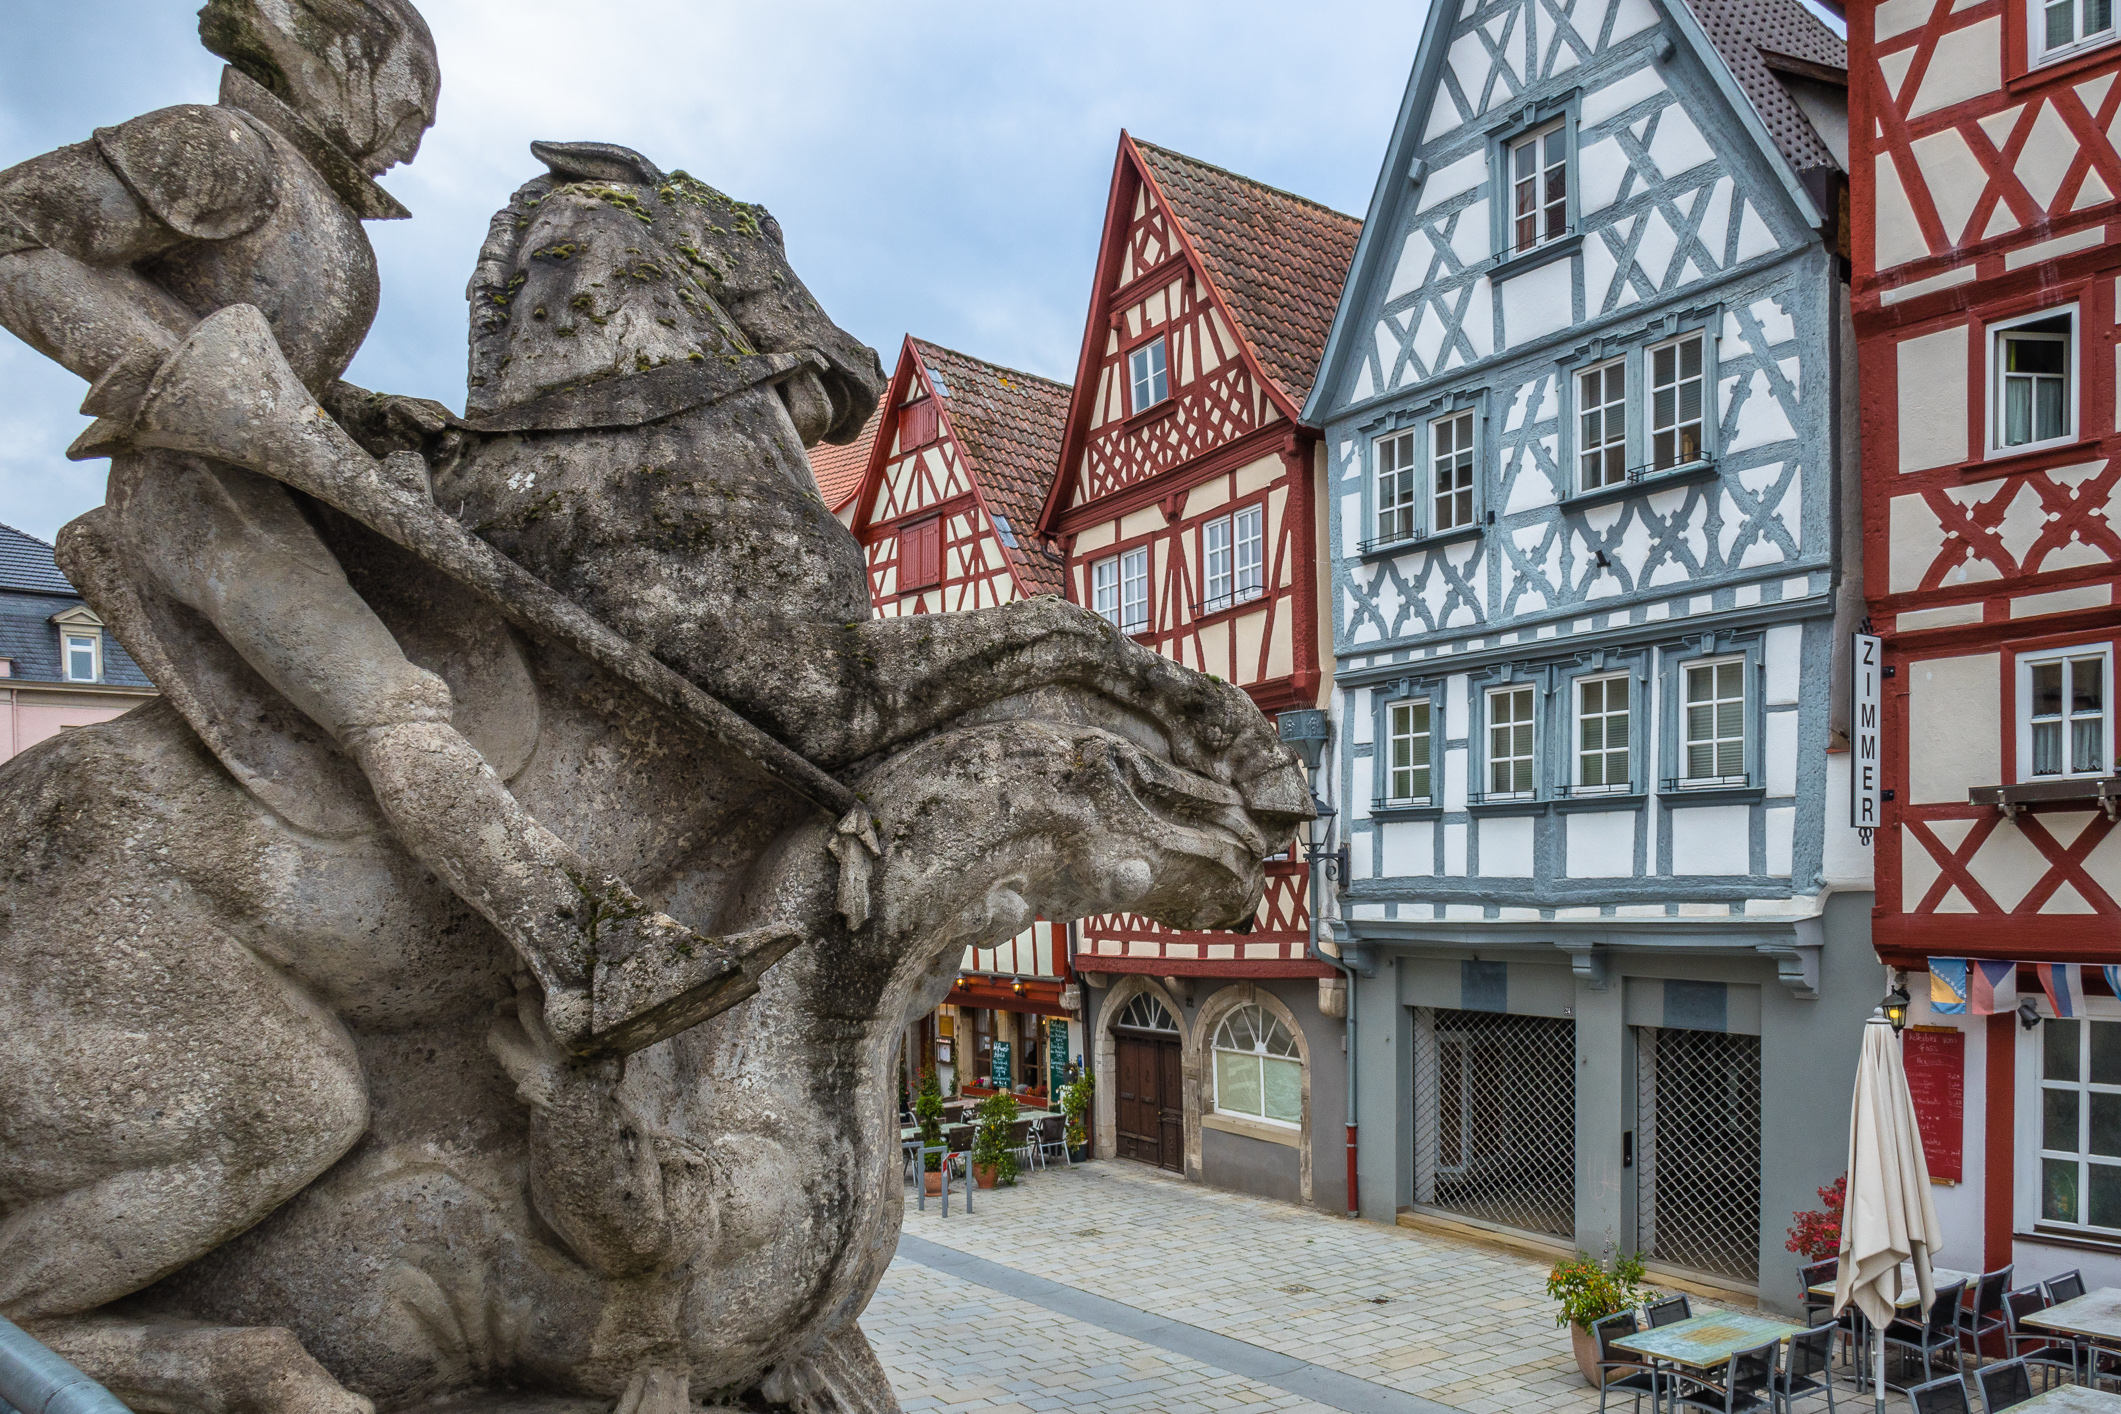 Altstadt von Ochsenfurt